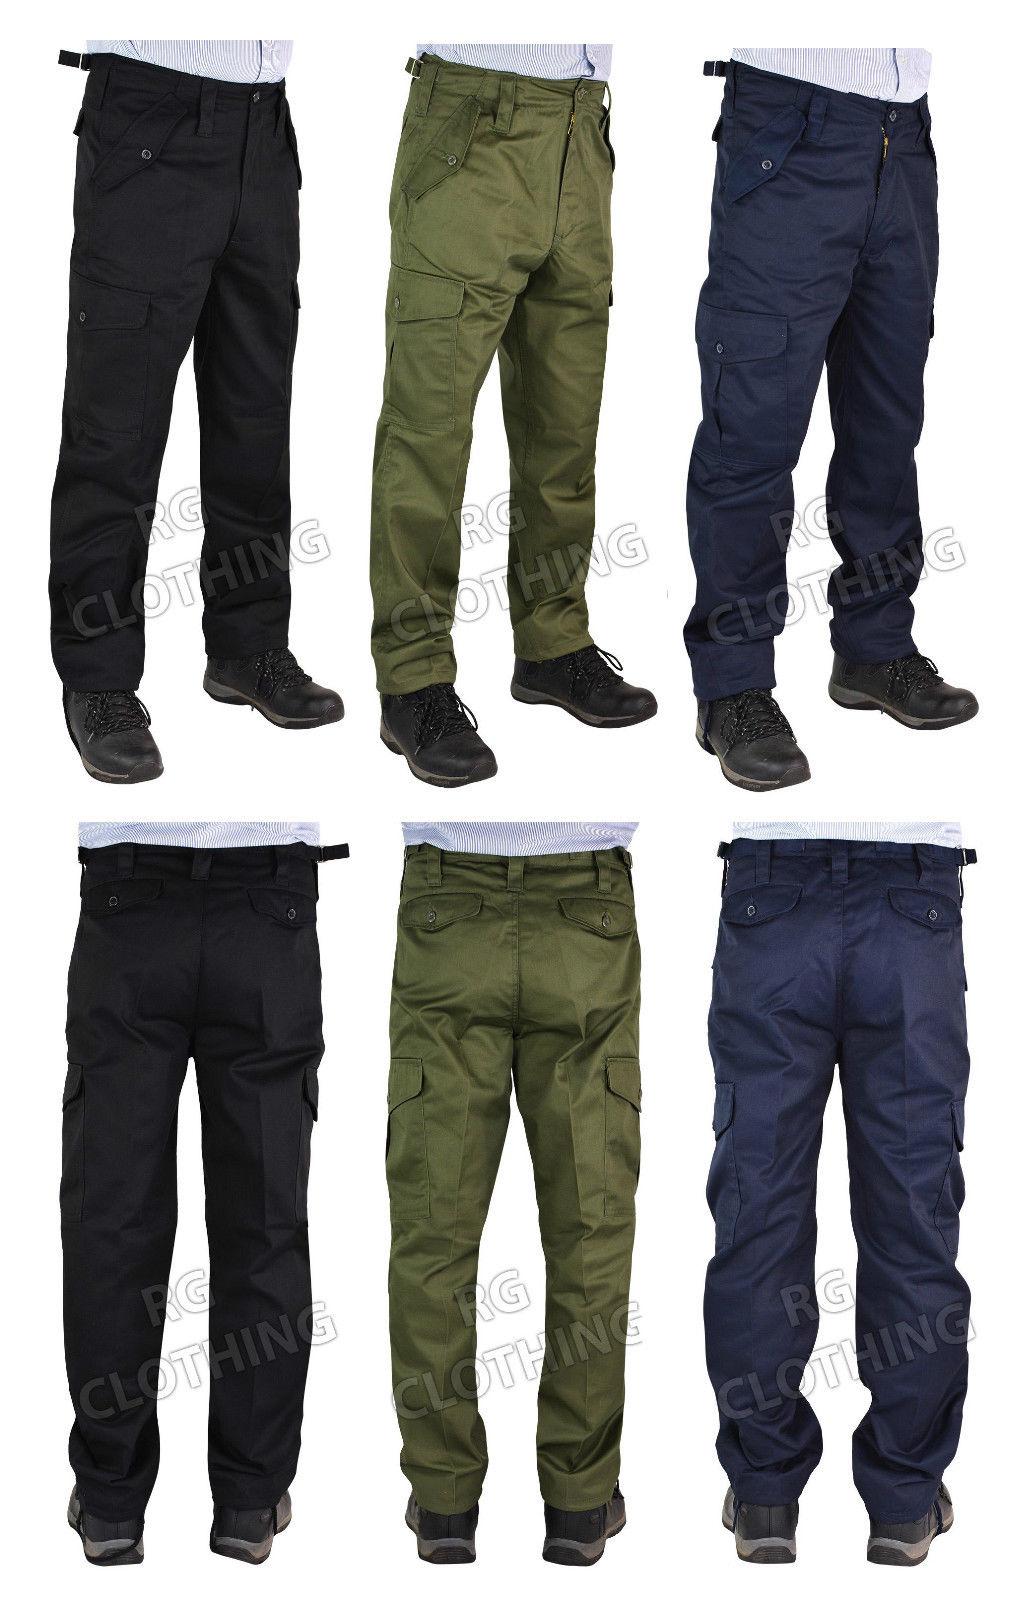 Men Plain Big Size Work/Casual Cargo Combat Trousers Size 28-62 Leg 29.5